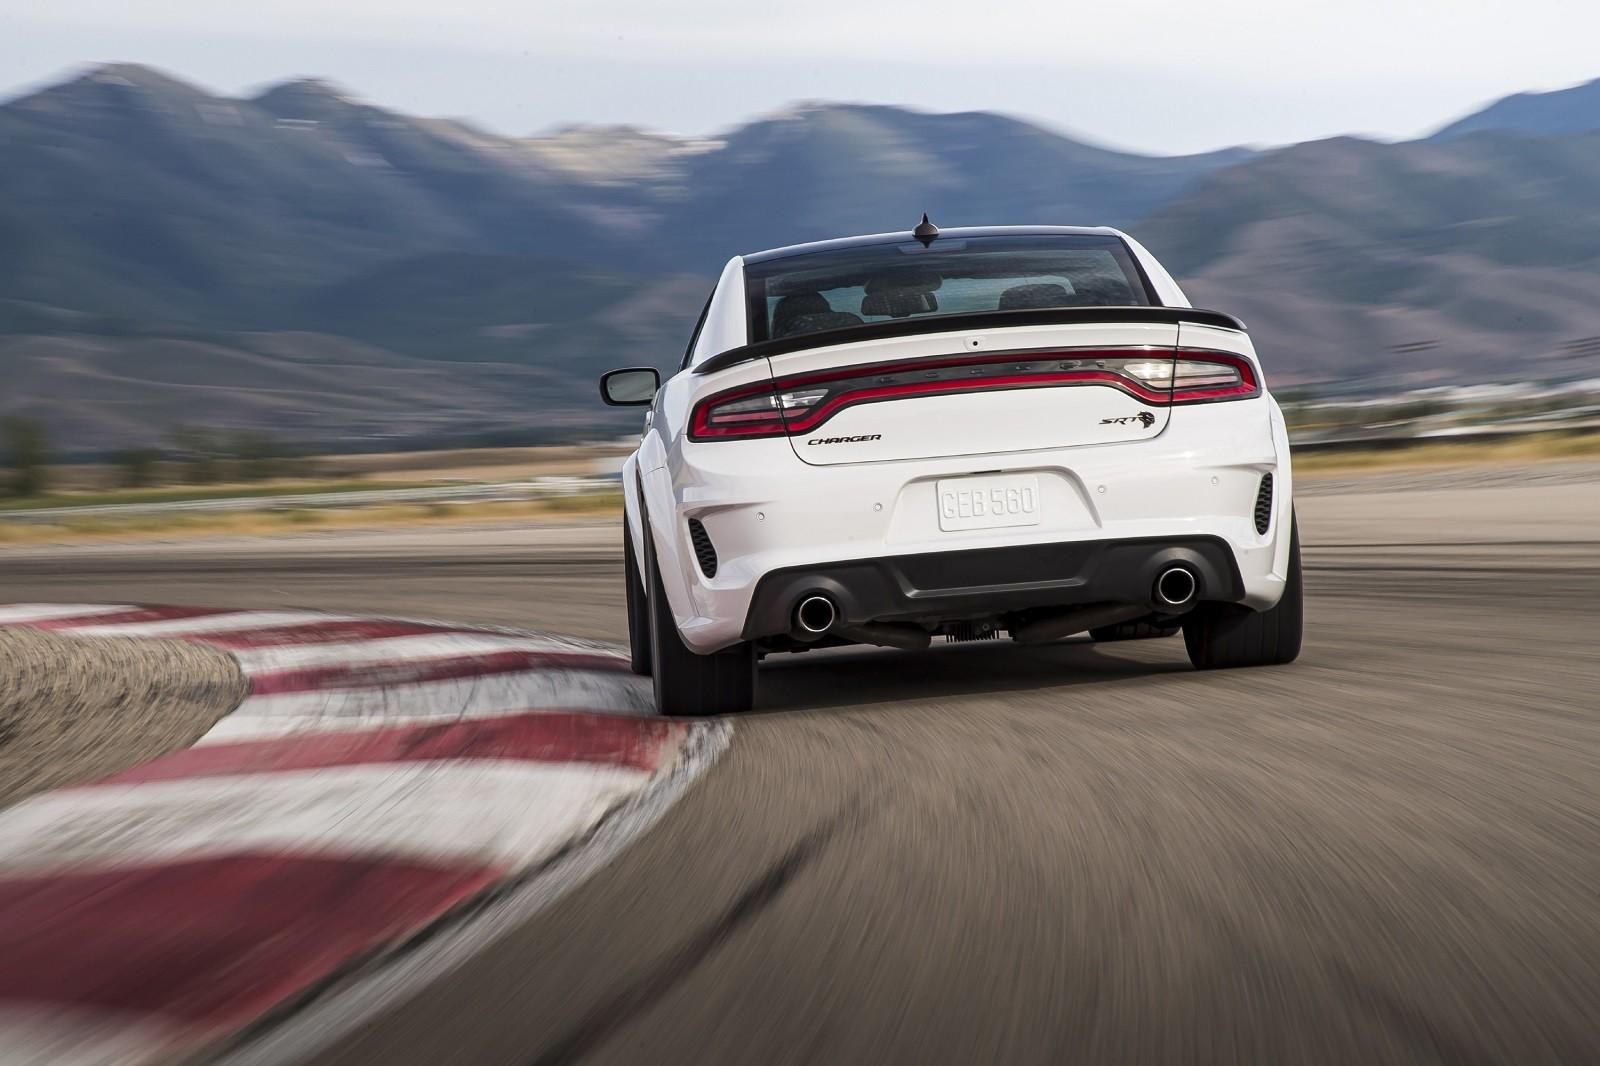 Foto de Dodge Charger SRT Hellcat Redeye 2021 (43/49)